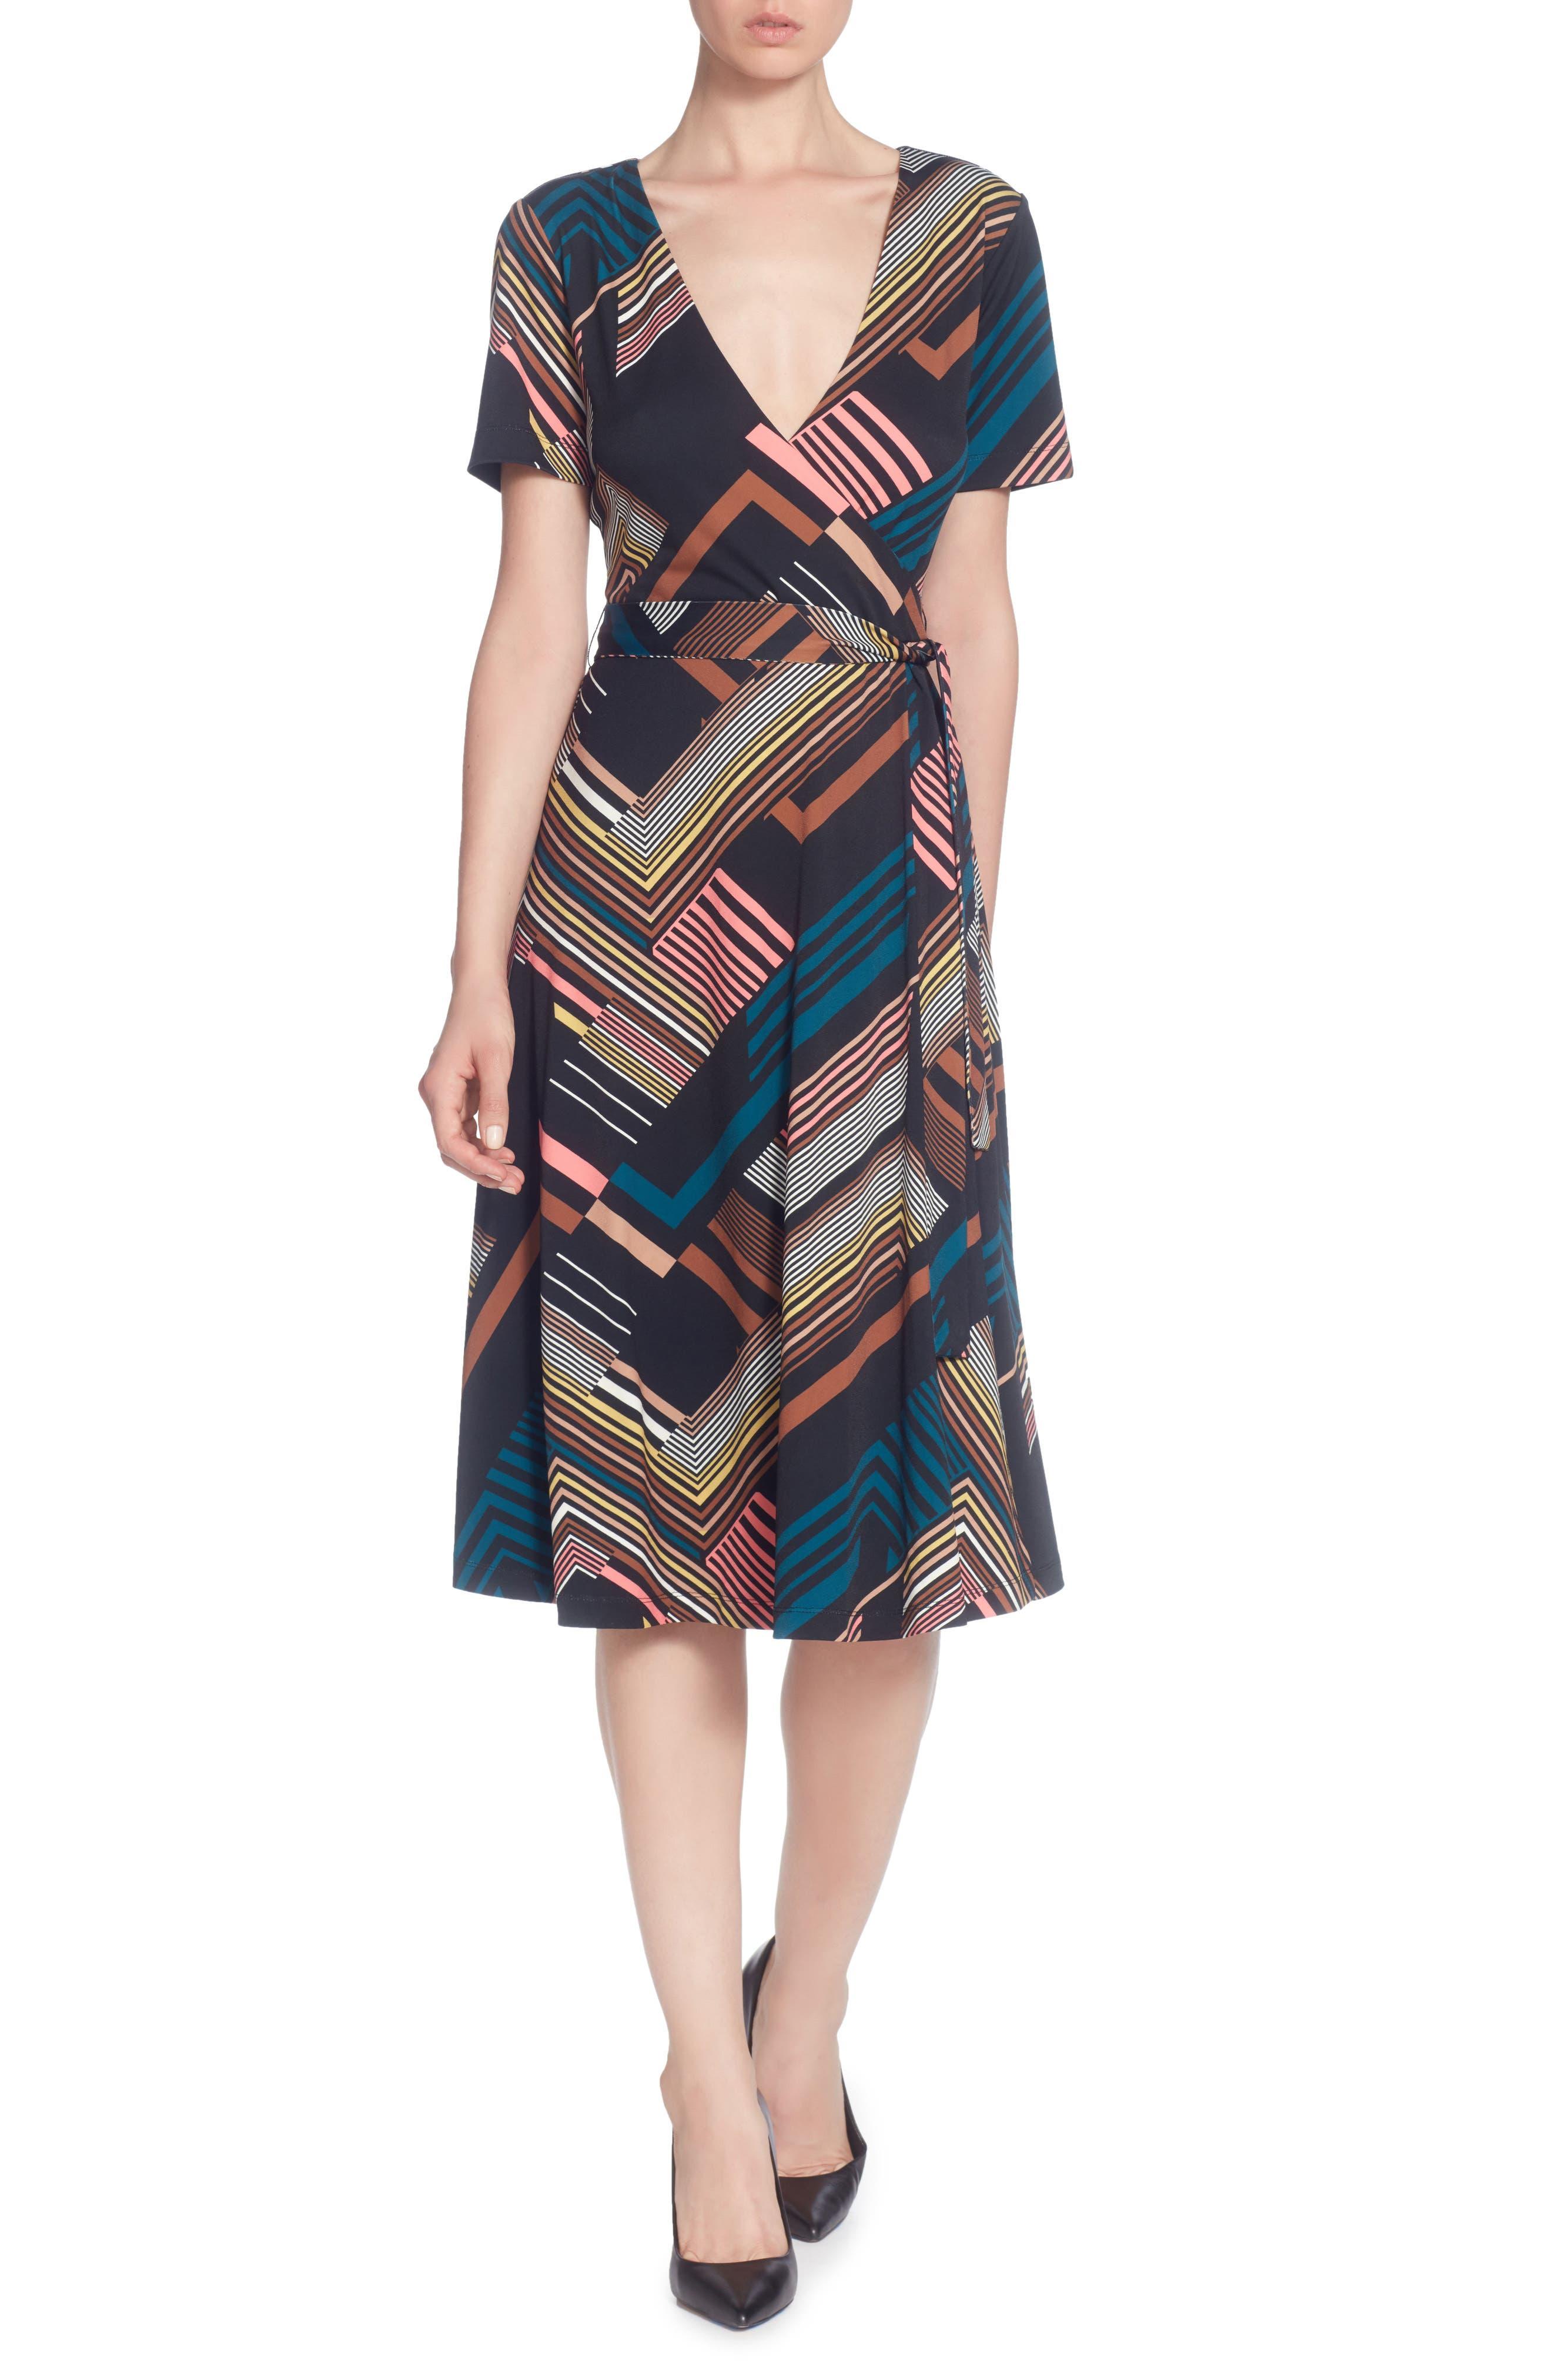 Taral Print Faux Wrap Dress,                             Main thumbnail 1, color,                             001